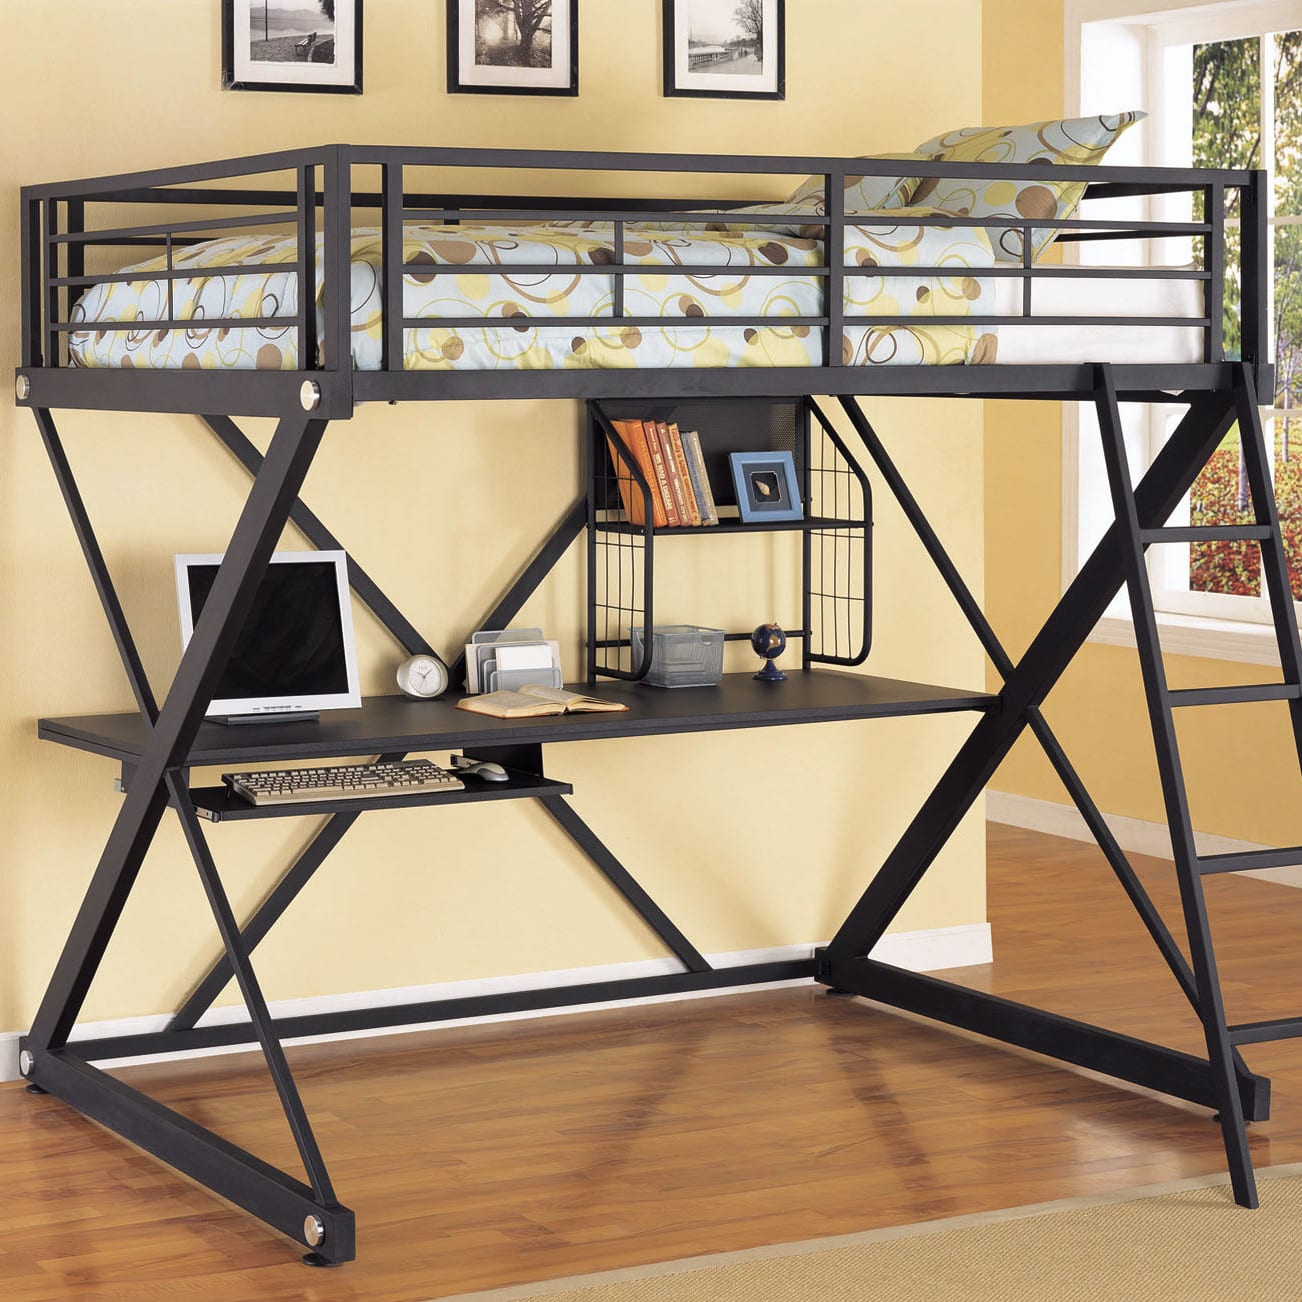 Fullsize Of Bunk Bed Desk